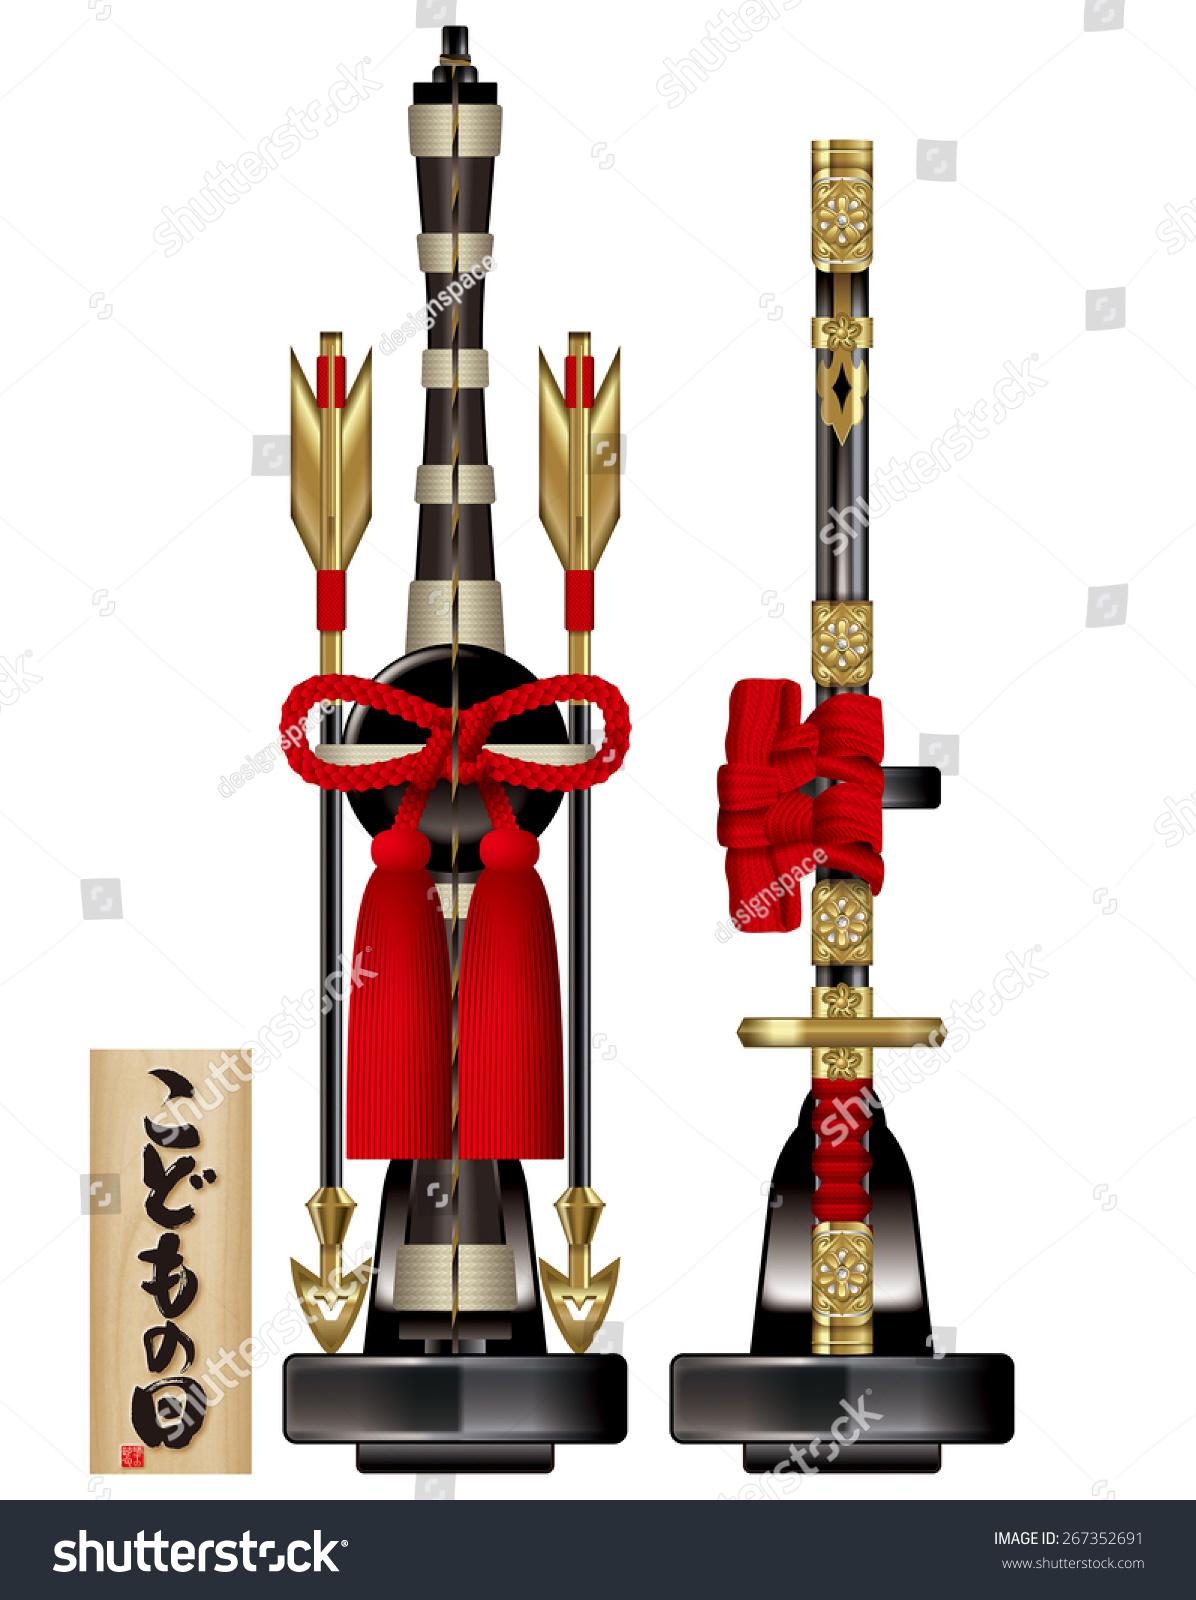 Target Toys For Boys Swords : Katana sword bow and arrow toy the japanese children